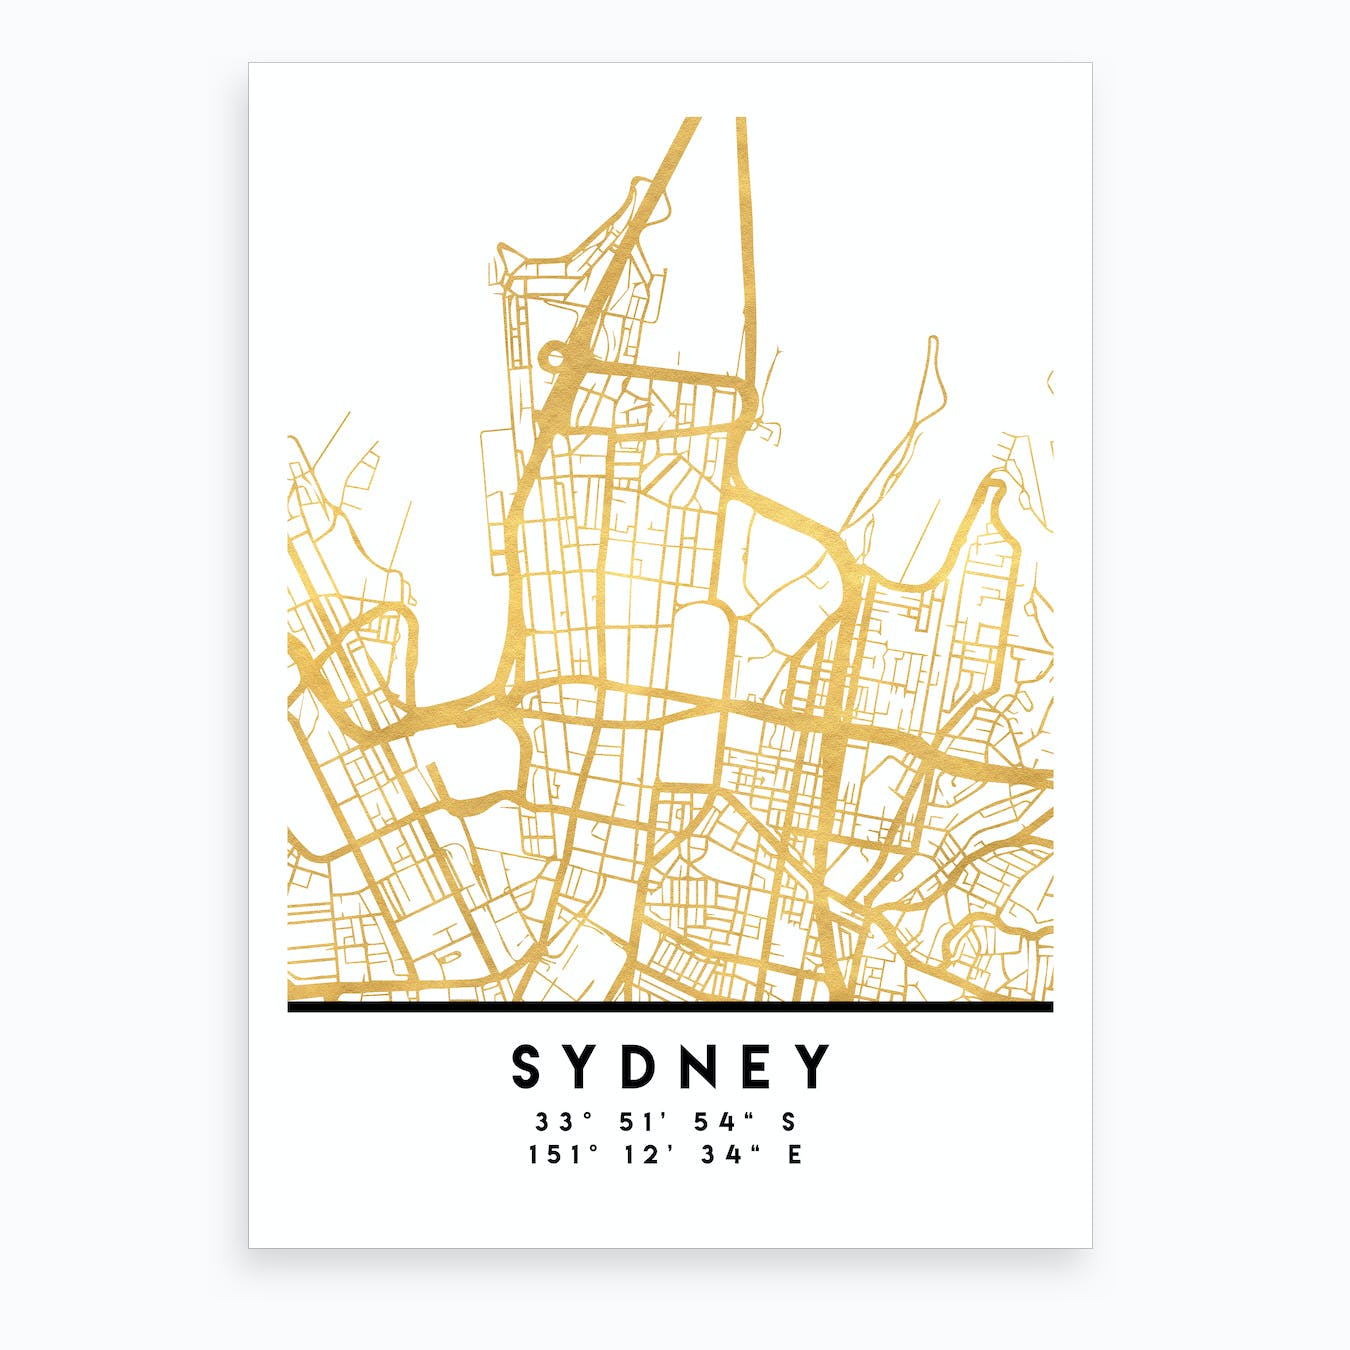 Sydney Australia City Street Map